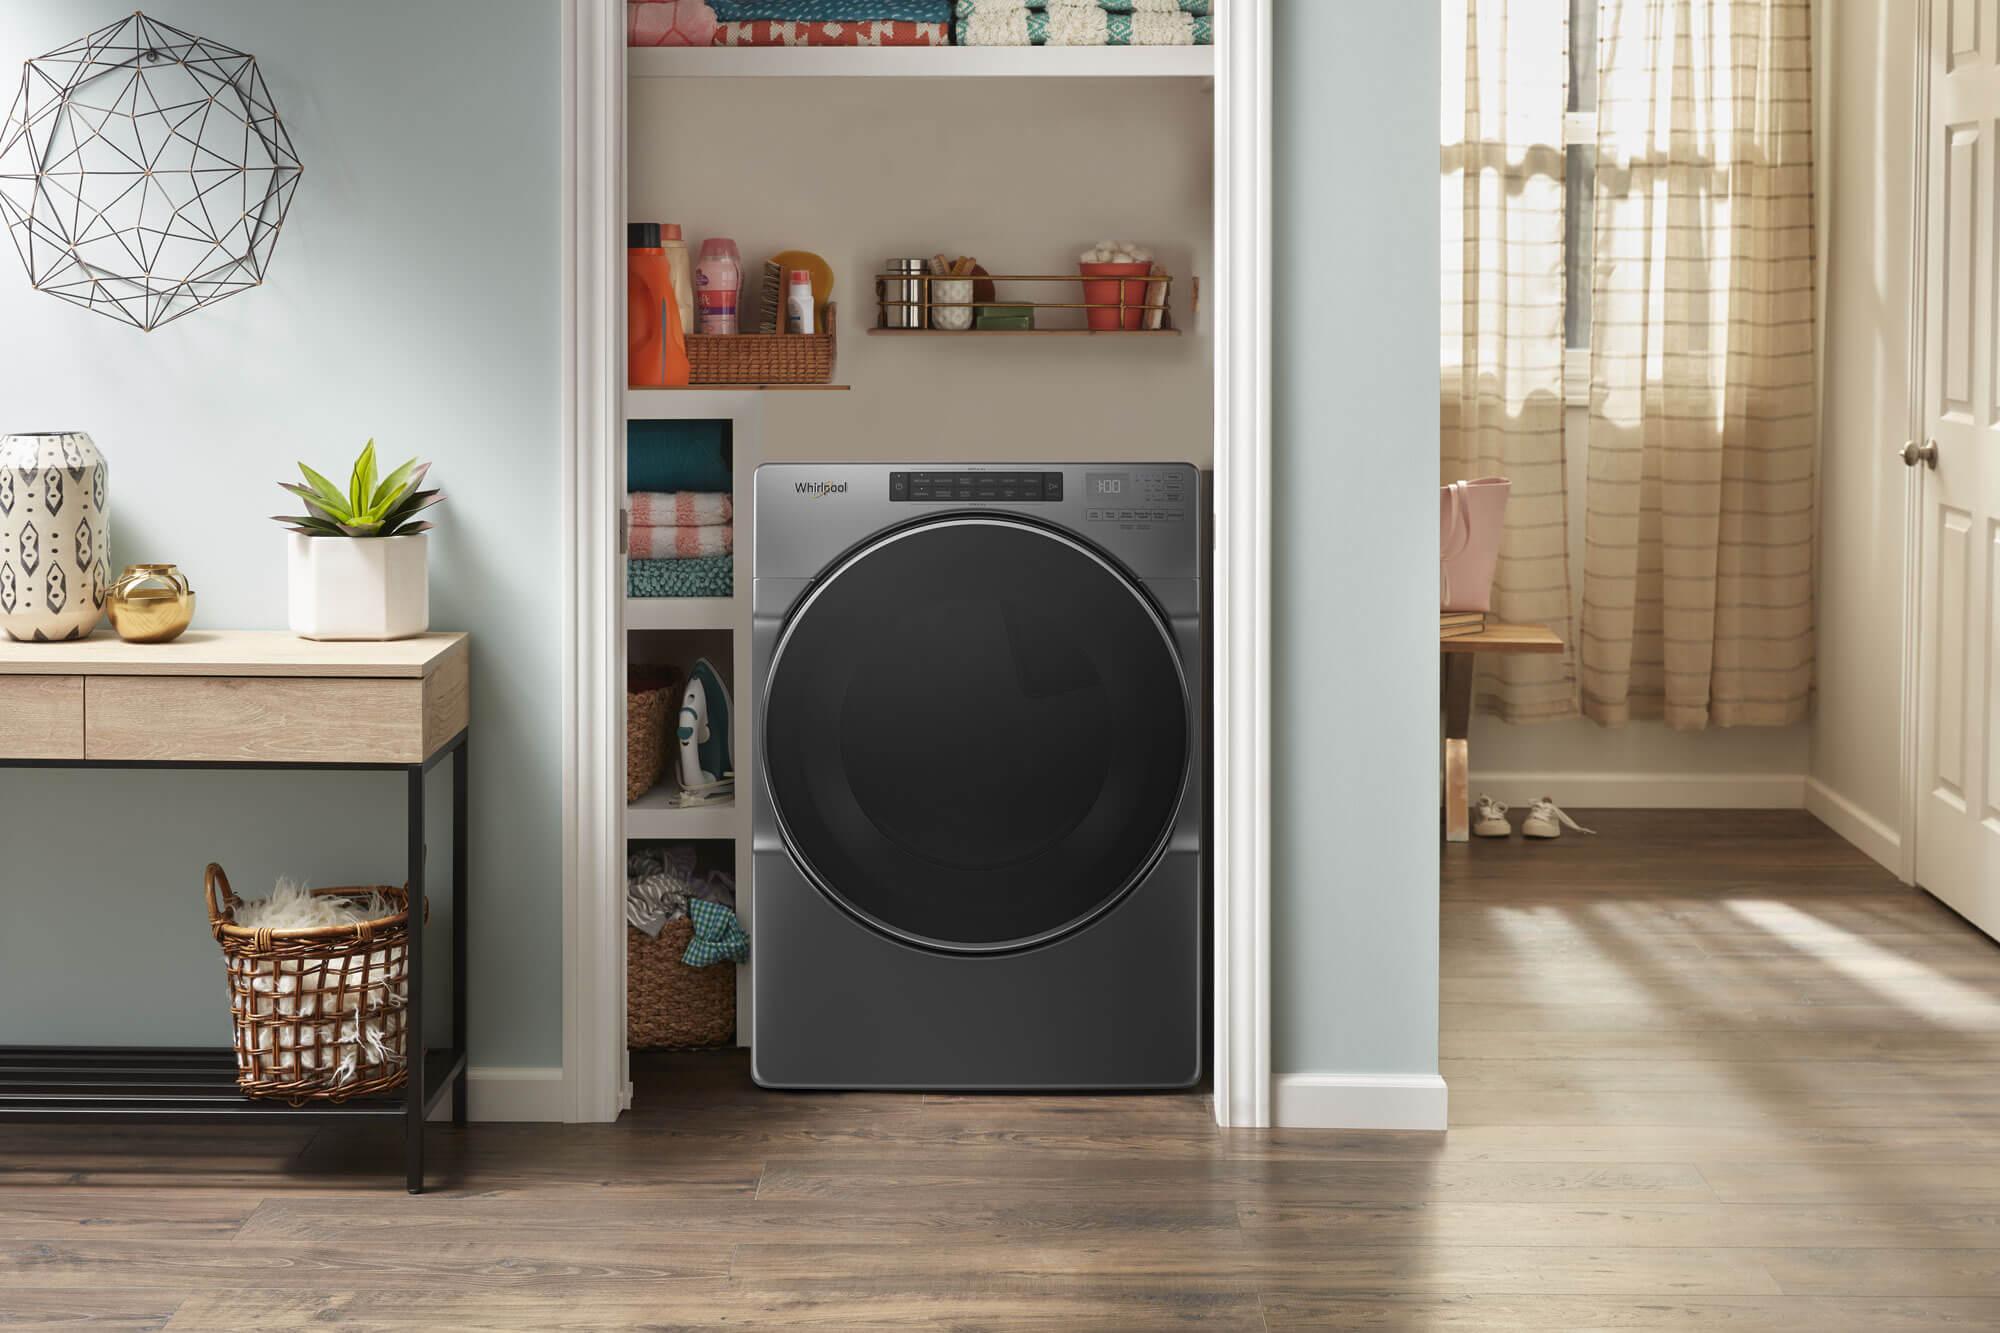 Una máquina futurista en tu hogar.